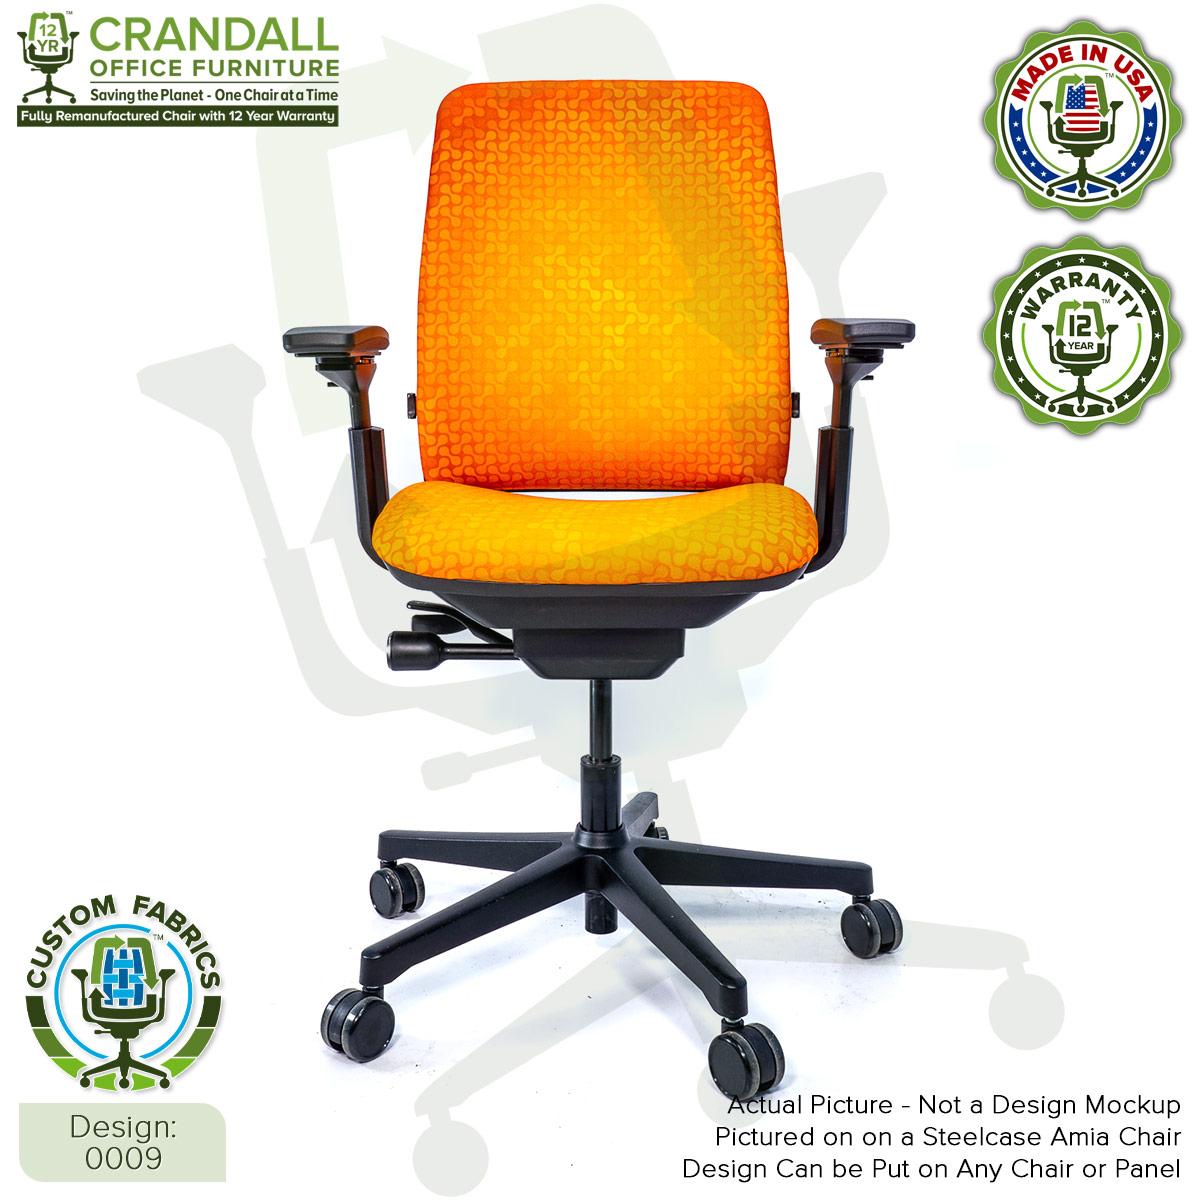 Custom Fabric Remanufactured Steelcase Amia Chair - Design 0009